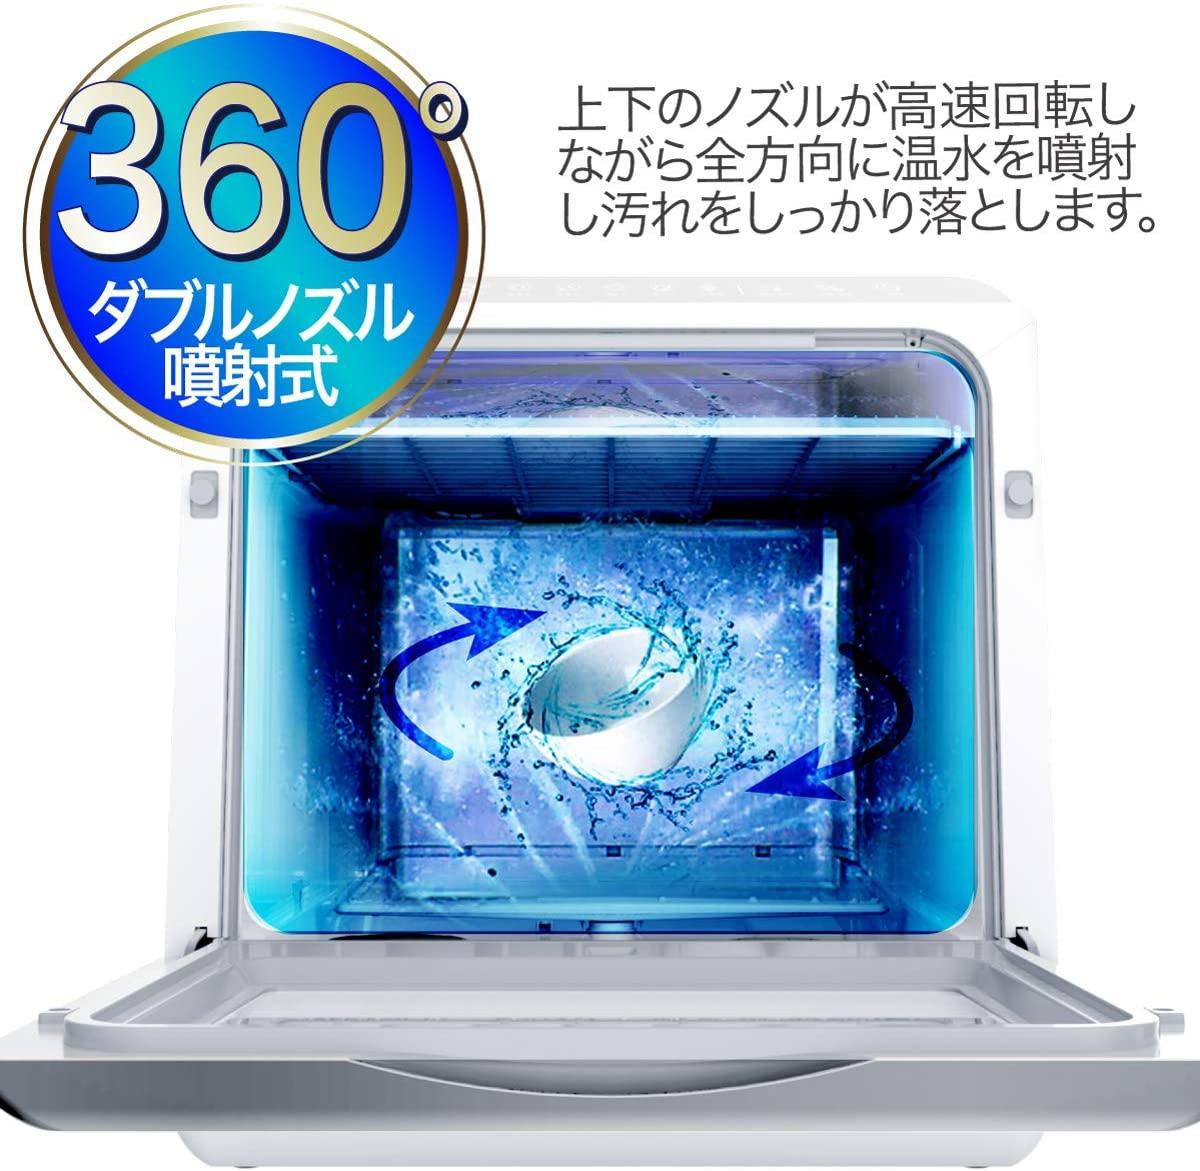 SOUYI(ソウイ) 食器洗い乾燥機 SY-118の商品画像5